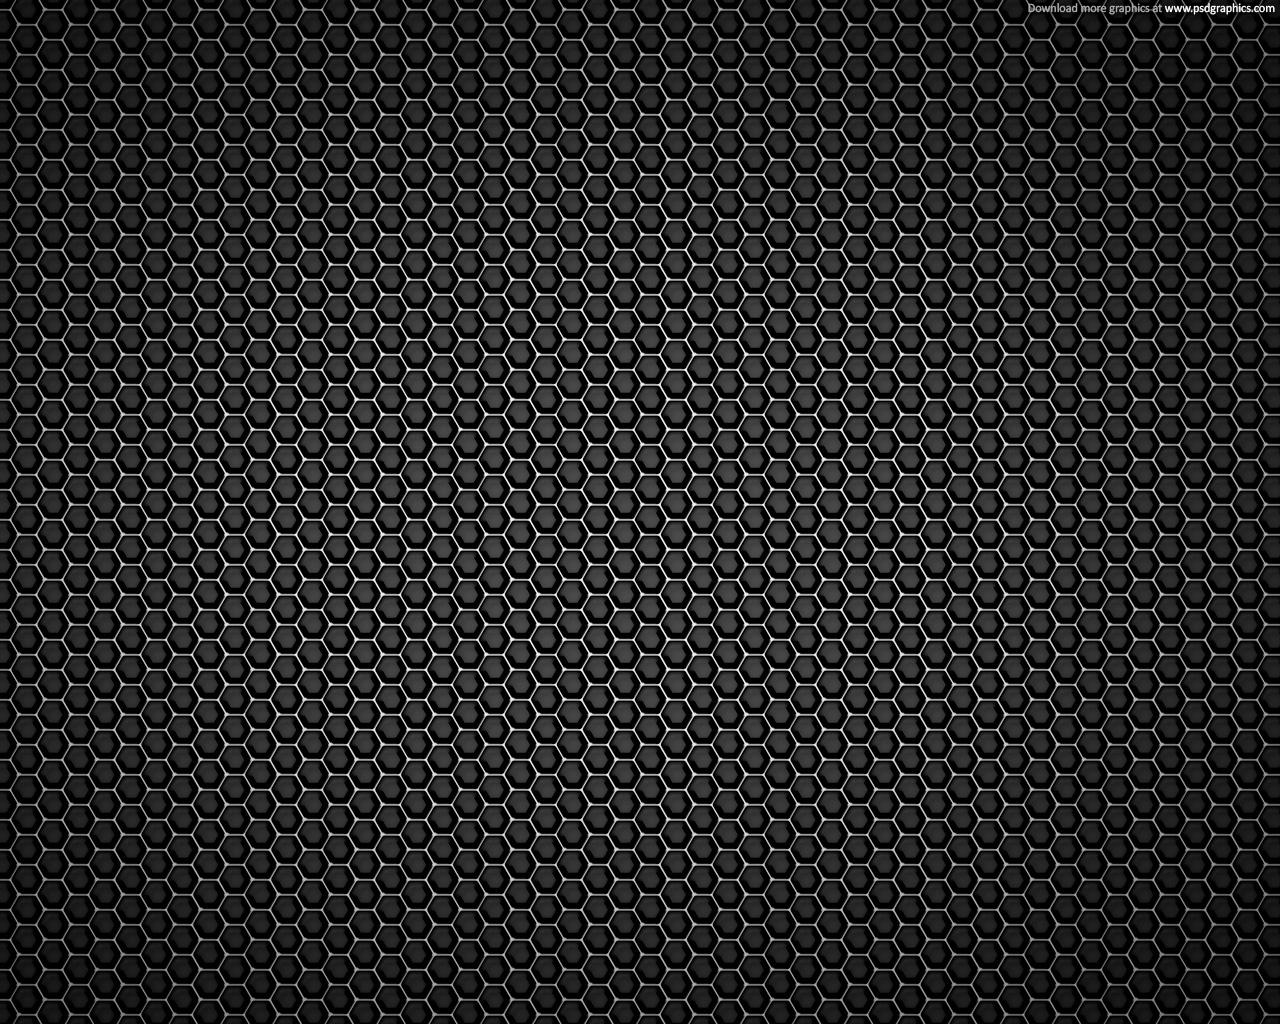 file format jpg color theme black gray keywords black stainless steel 1280x1024